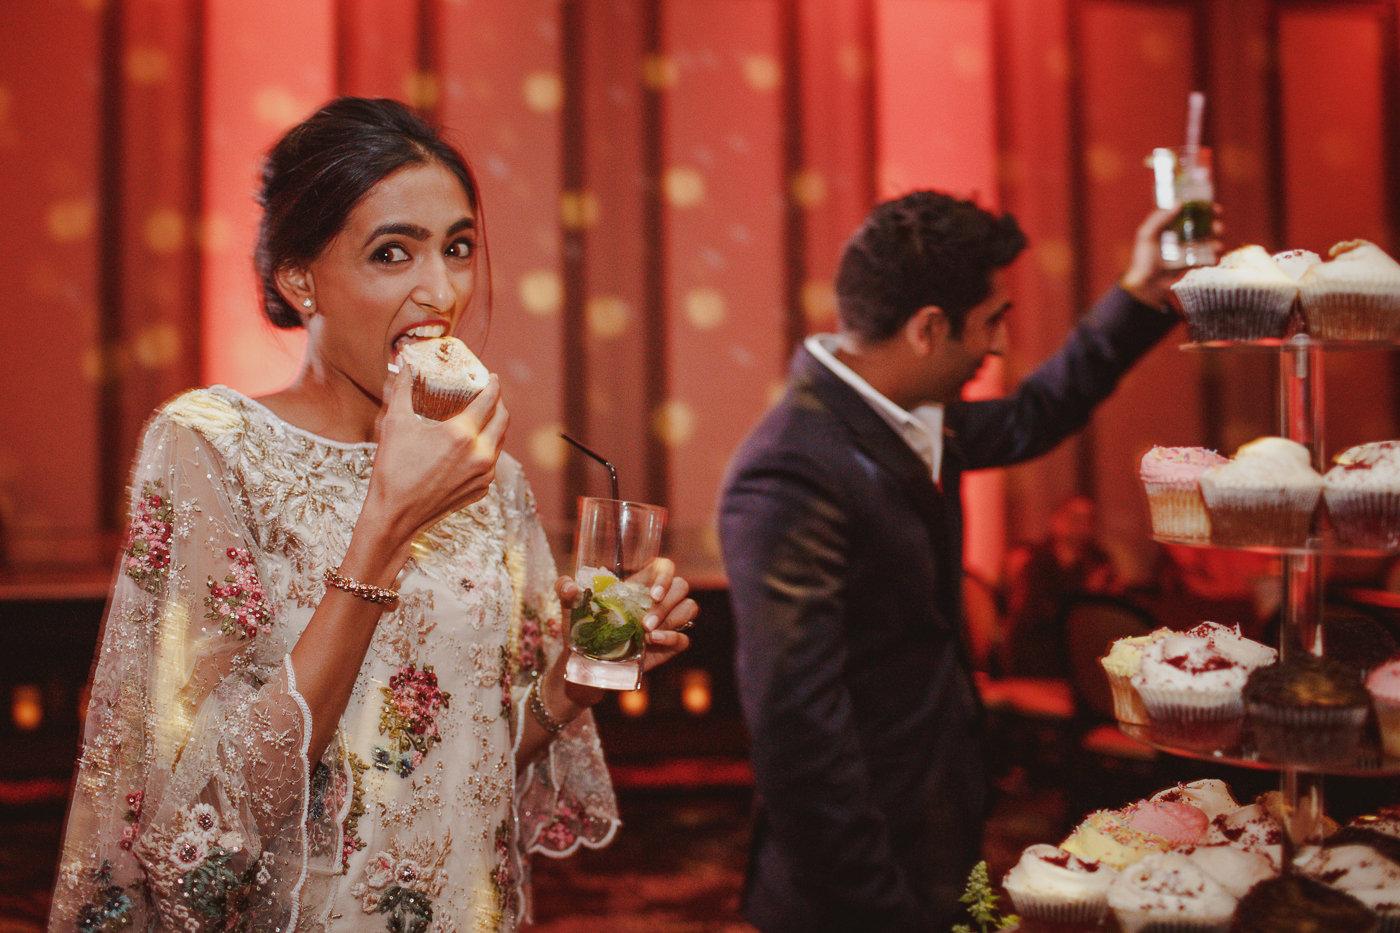 rosewood-hotel-wedding-photographer-20.jpg